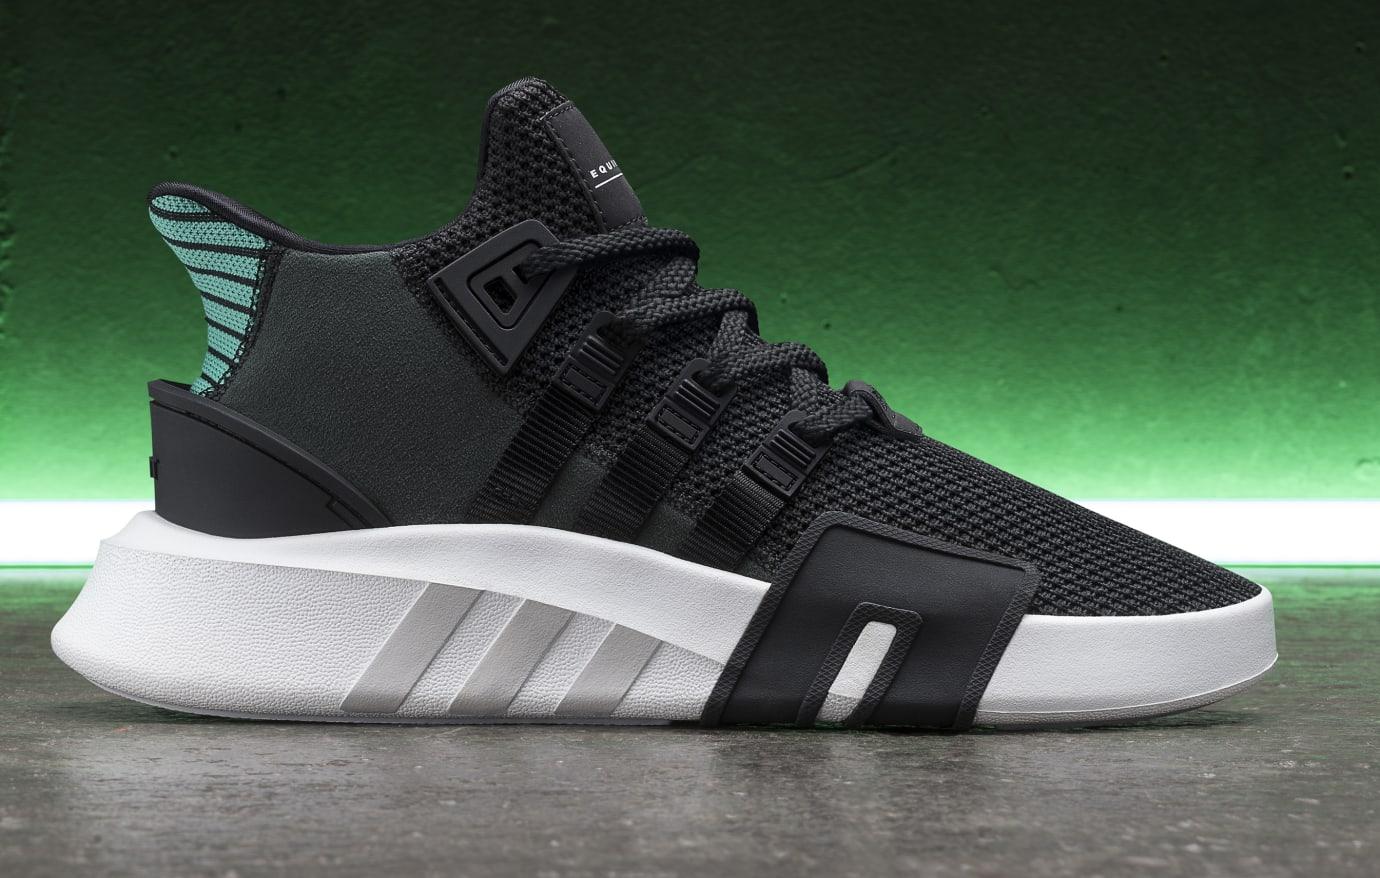 a407f3328c64 Adidas EQT Basketball ADV CQ2993 CQ2995 Release Date